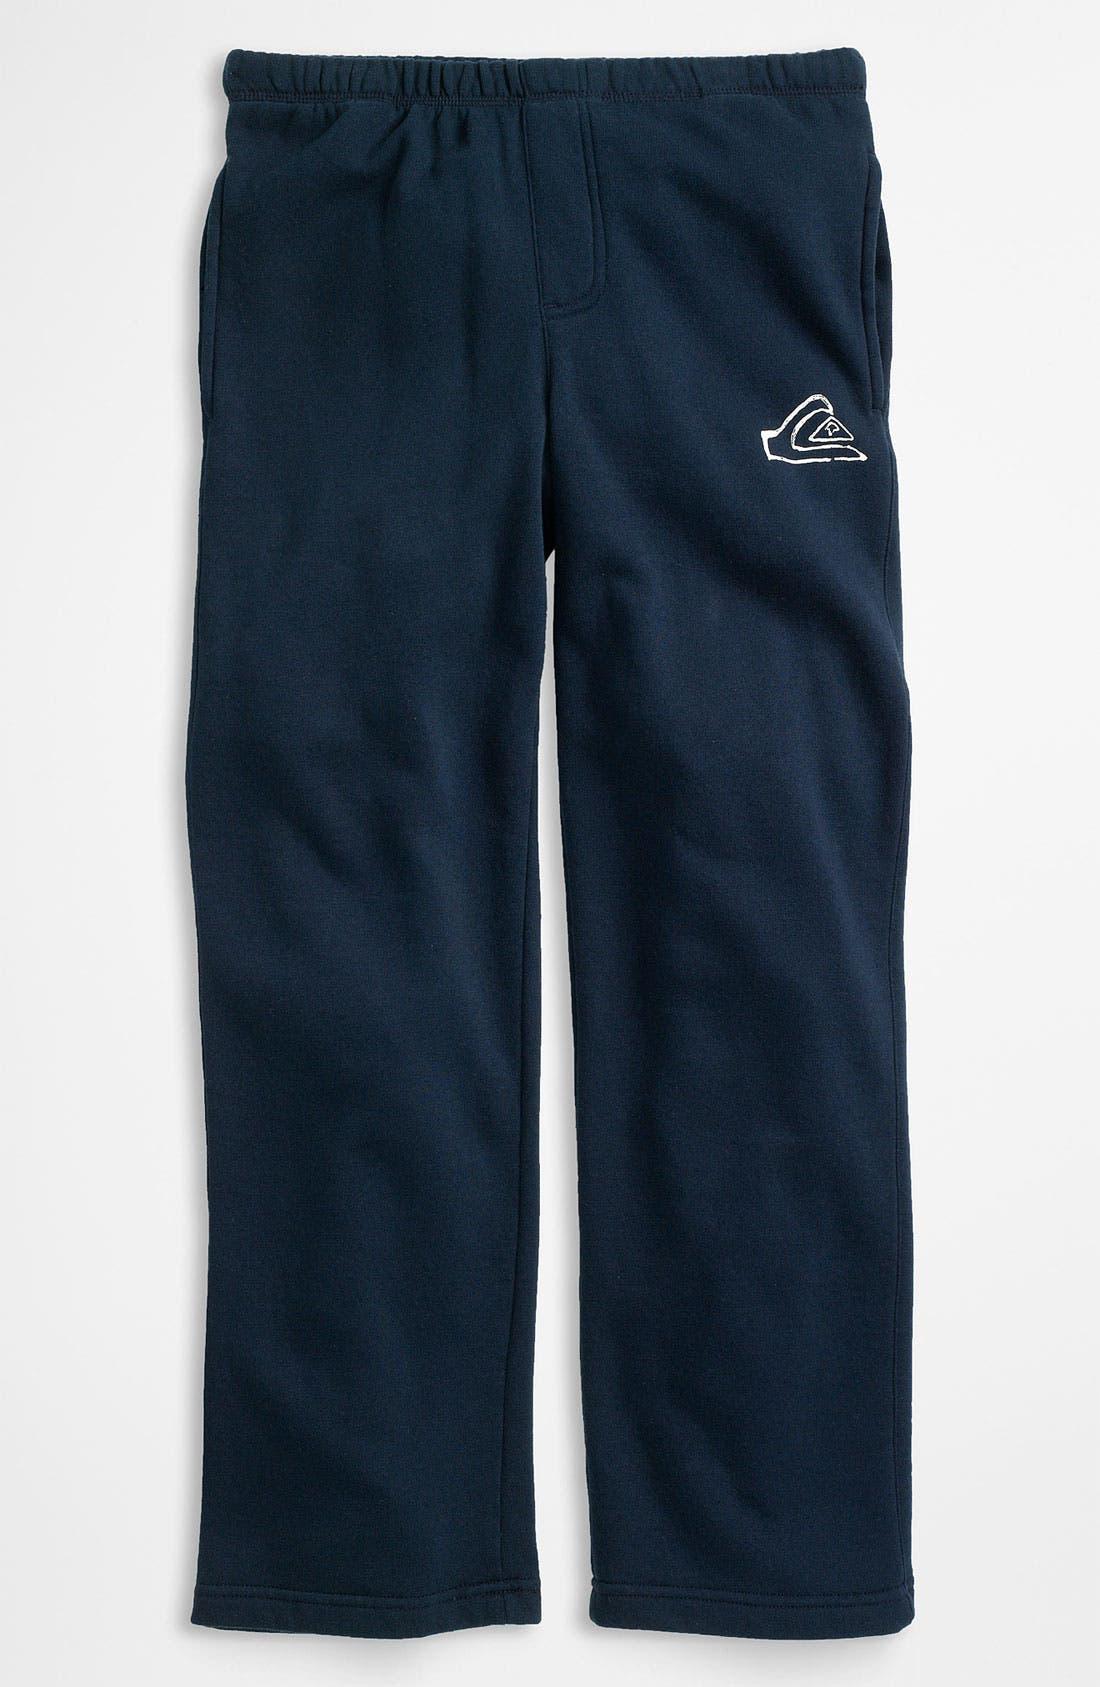 Alternate Image 1 Selected - Quiksilver 'Rest Stop' Fleece Pants (Little Boys)